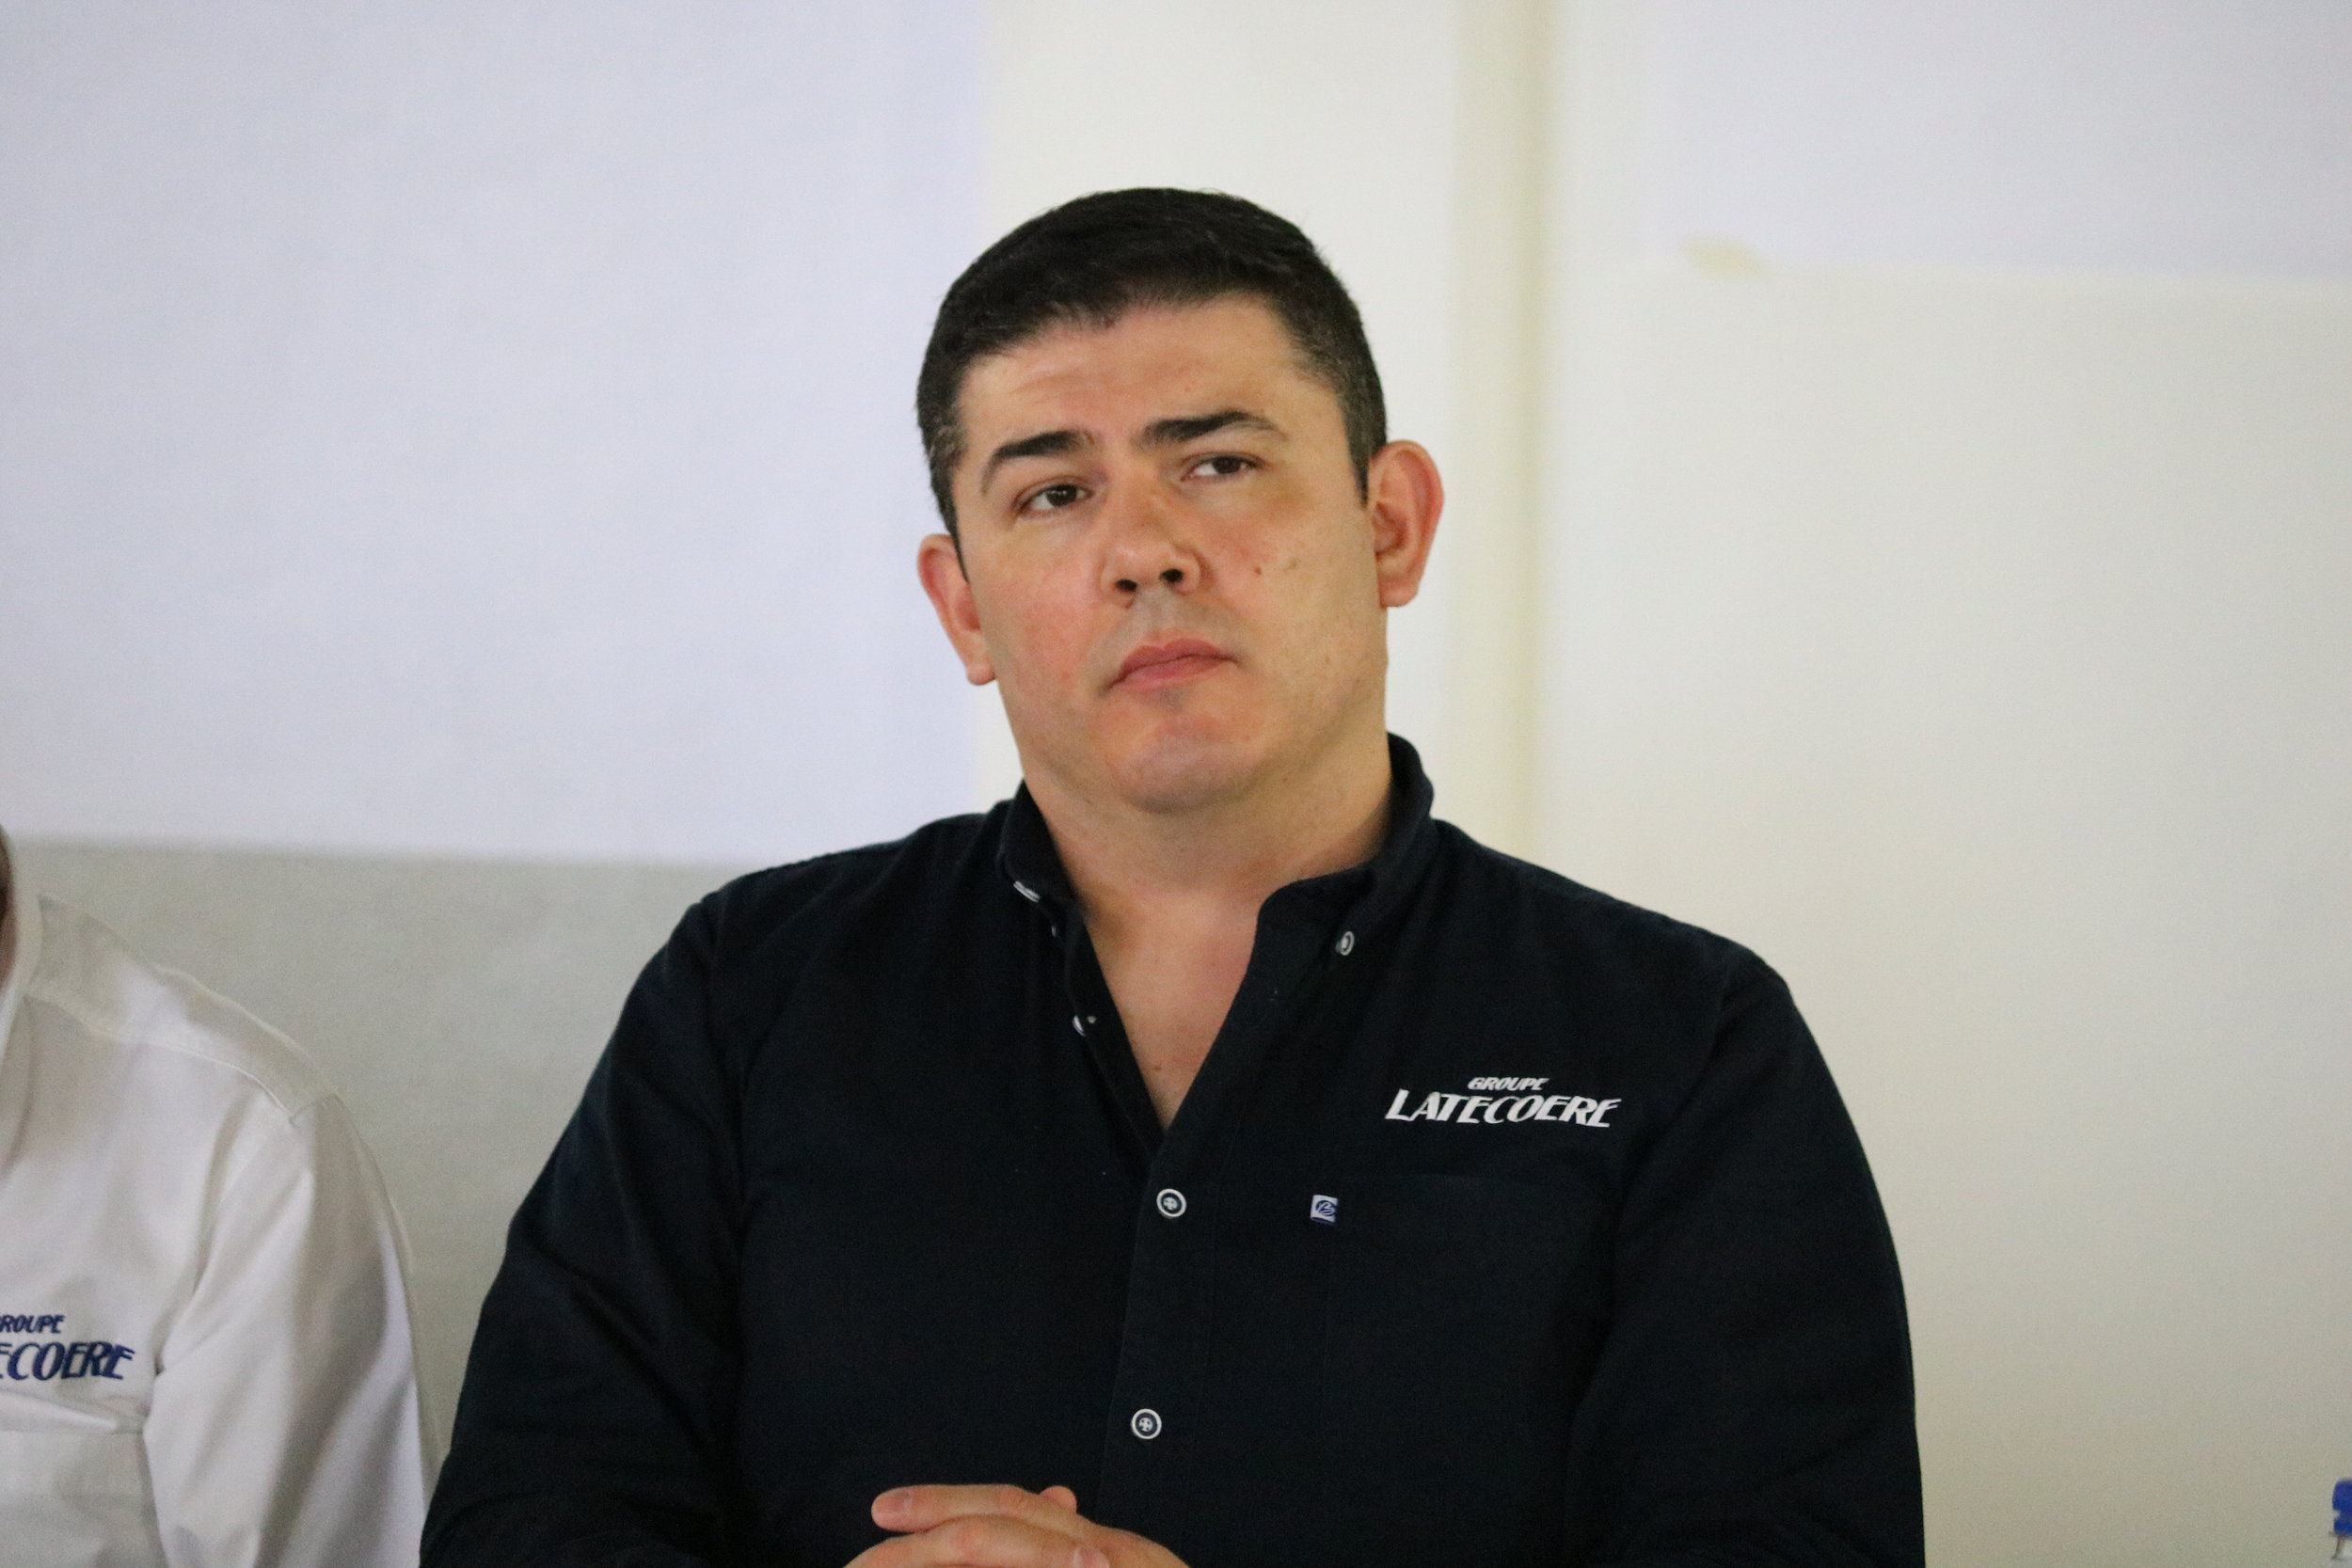 Carlos Sanchez, Latelec